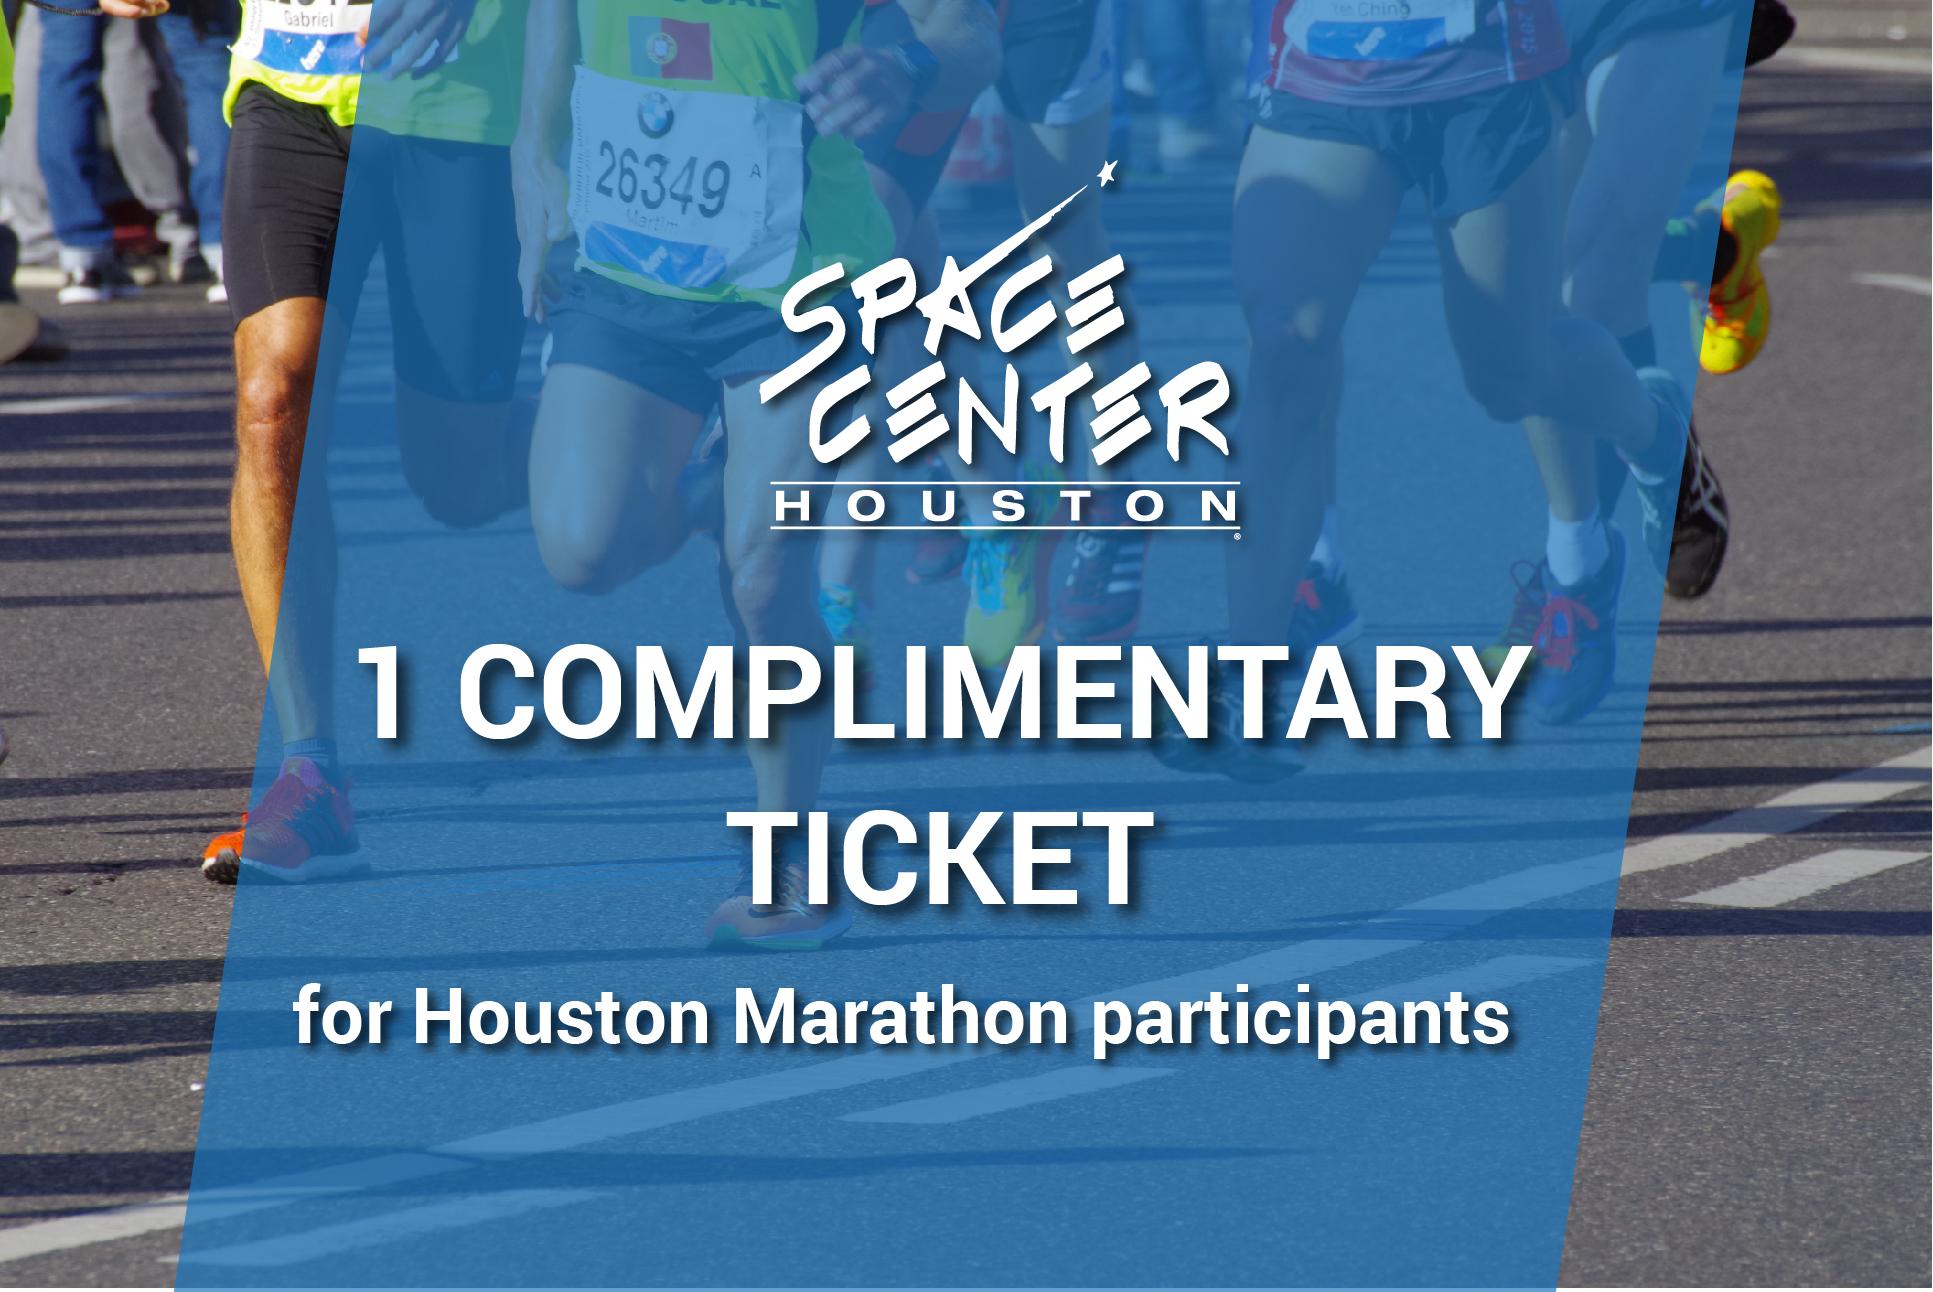 Space Center Houston Free Ticket